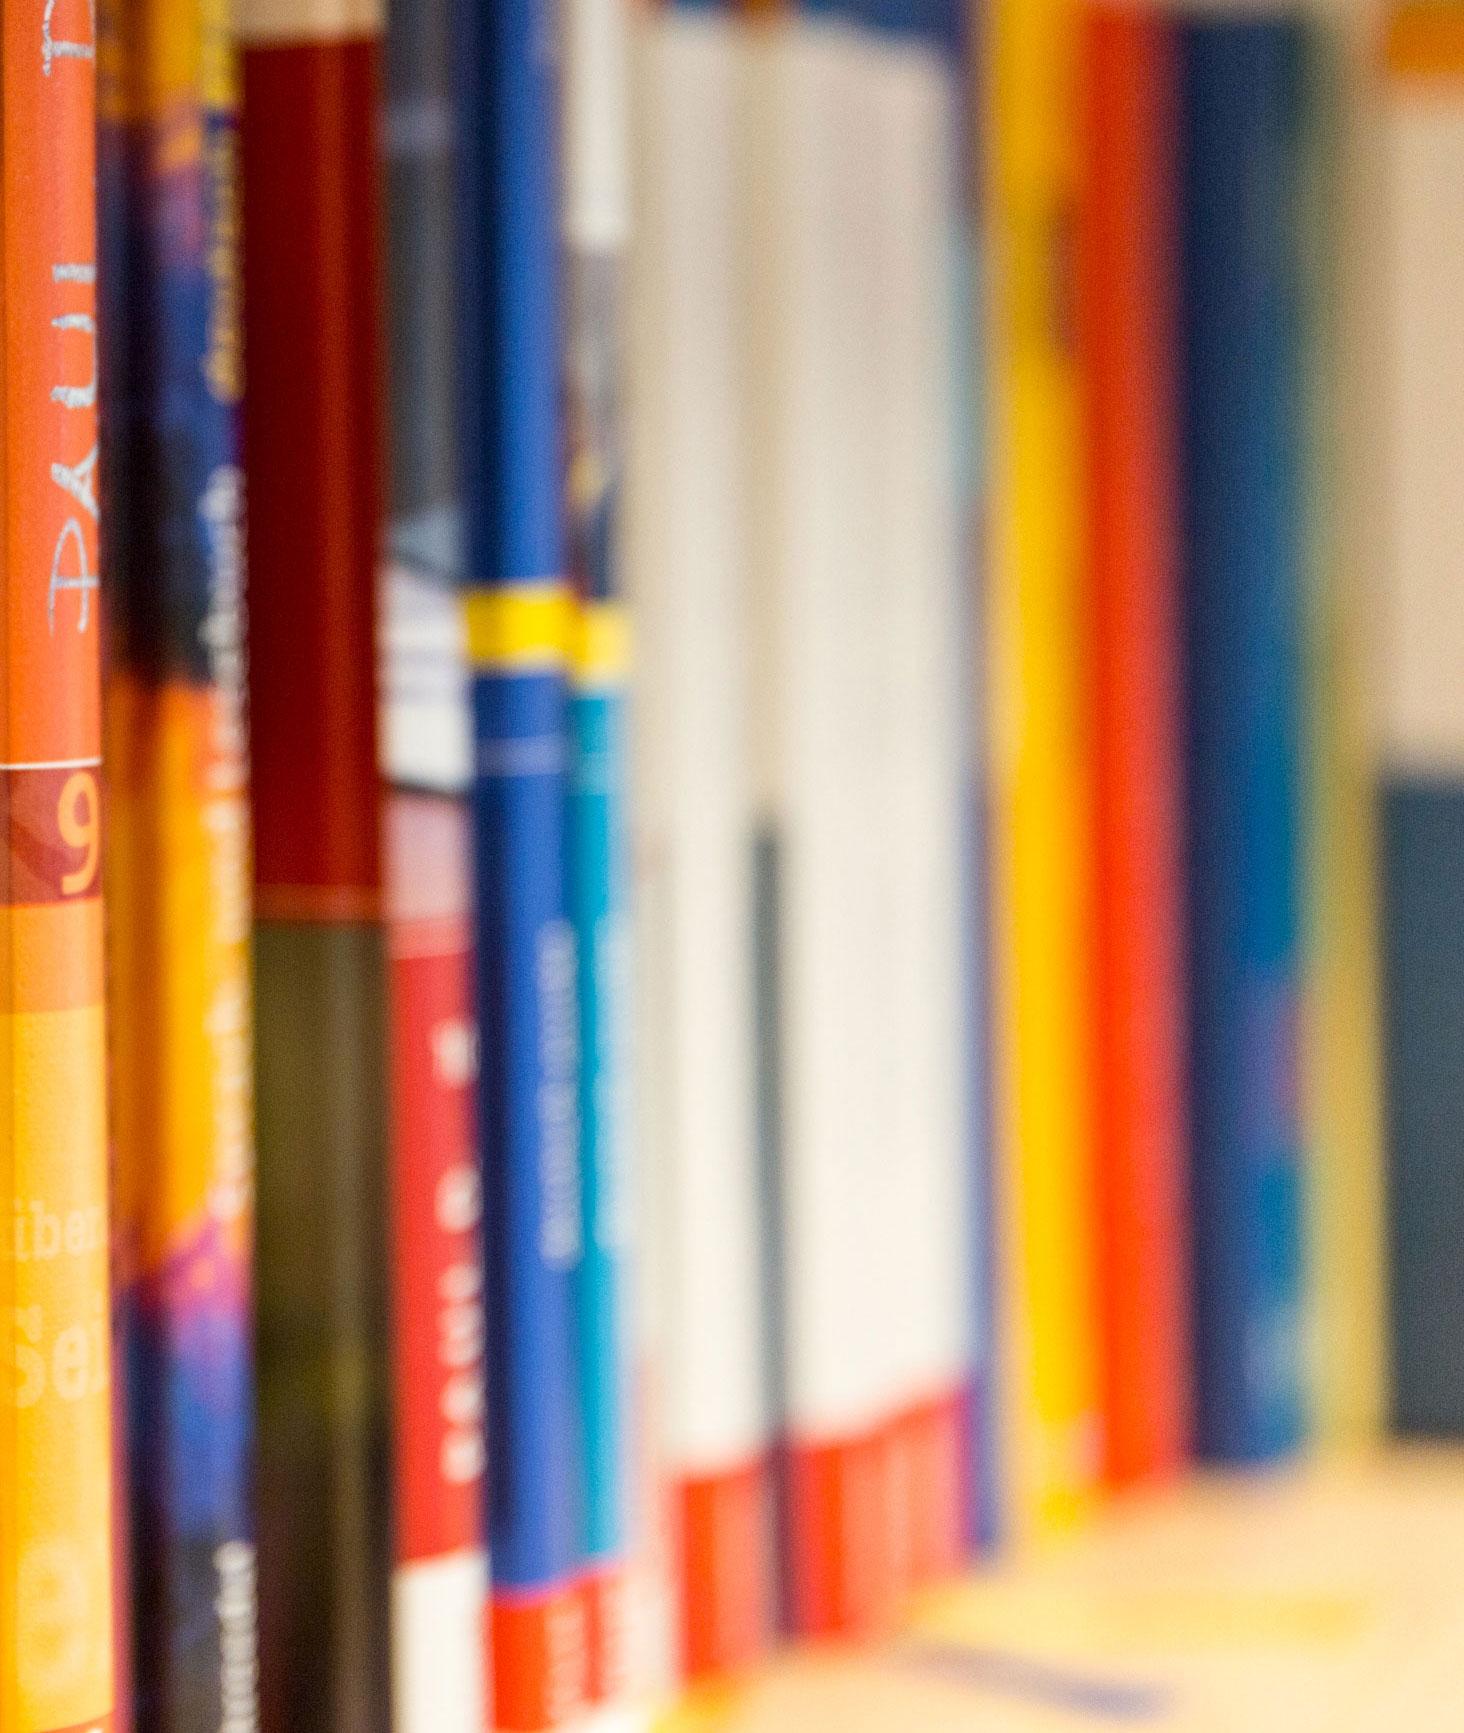 Bibliothek-5